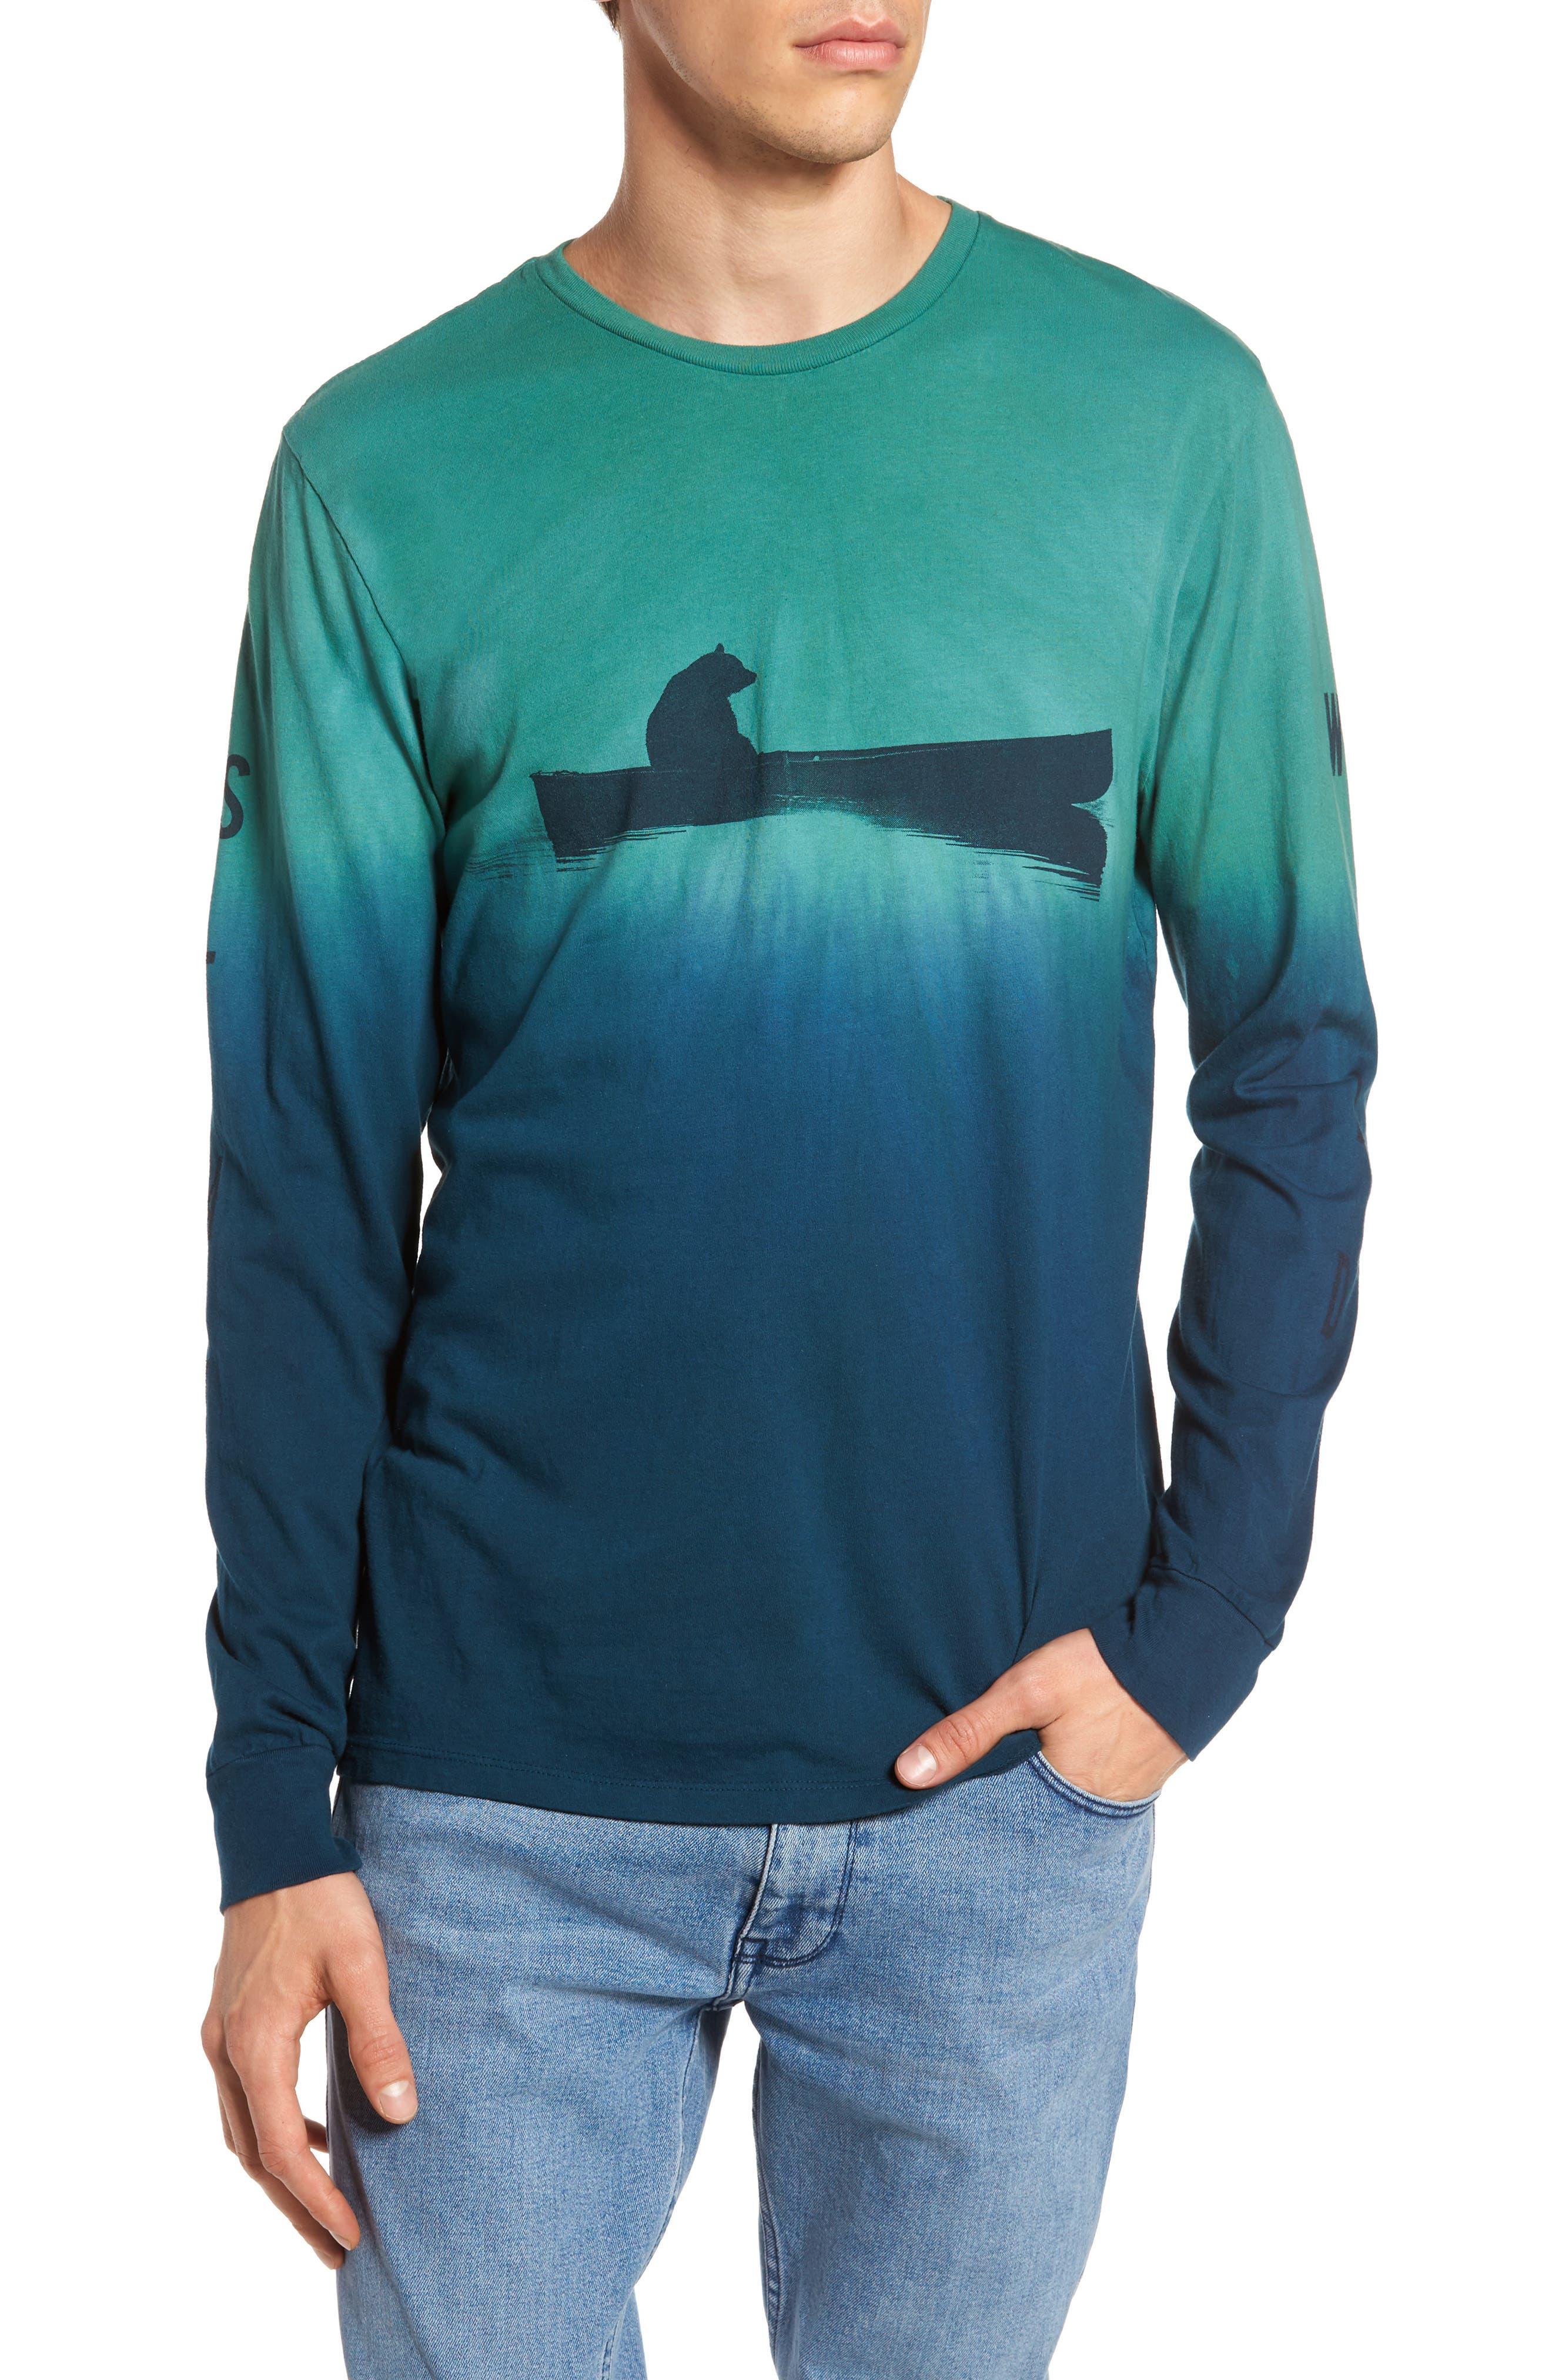 Up a Creek T-Shirt,                         Main,                         color, ALGAE/ NAVY